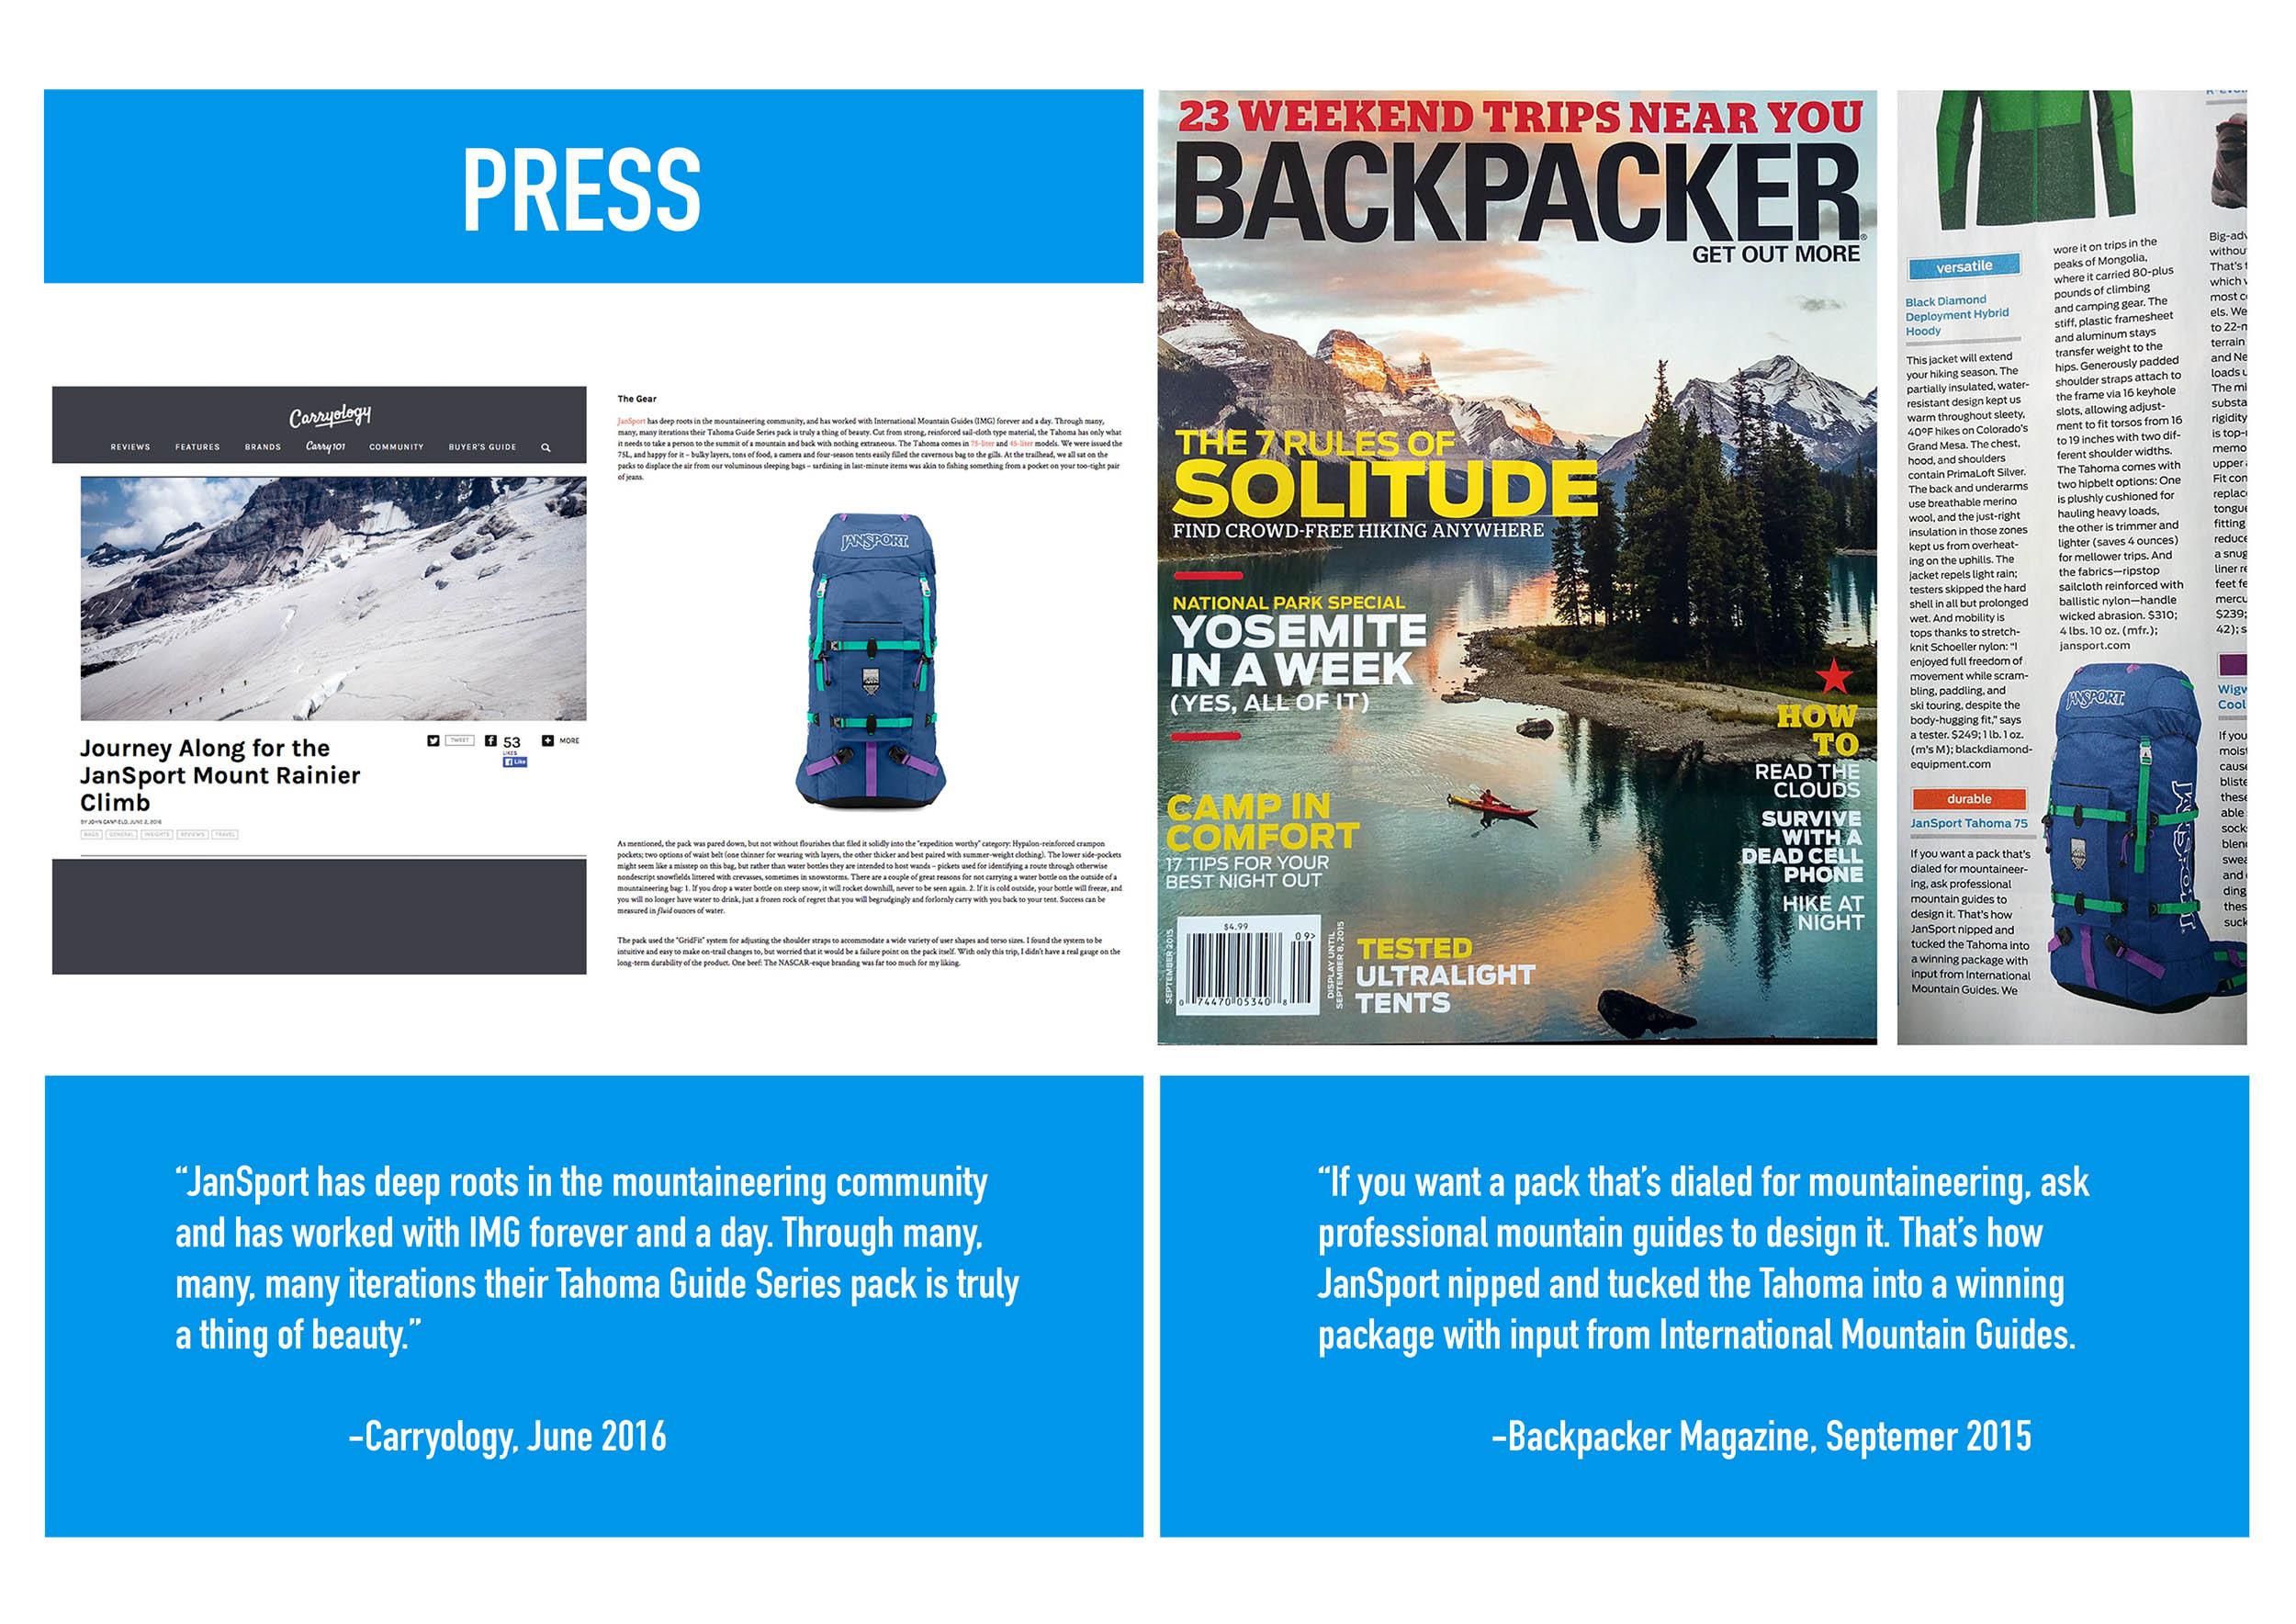 International Mountain Guides Backpack Design Backpacker Magazine Carryology